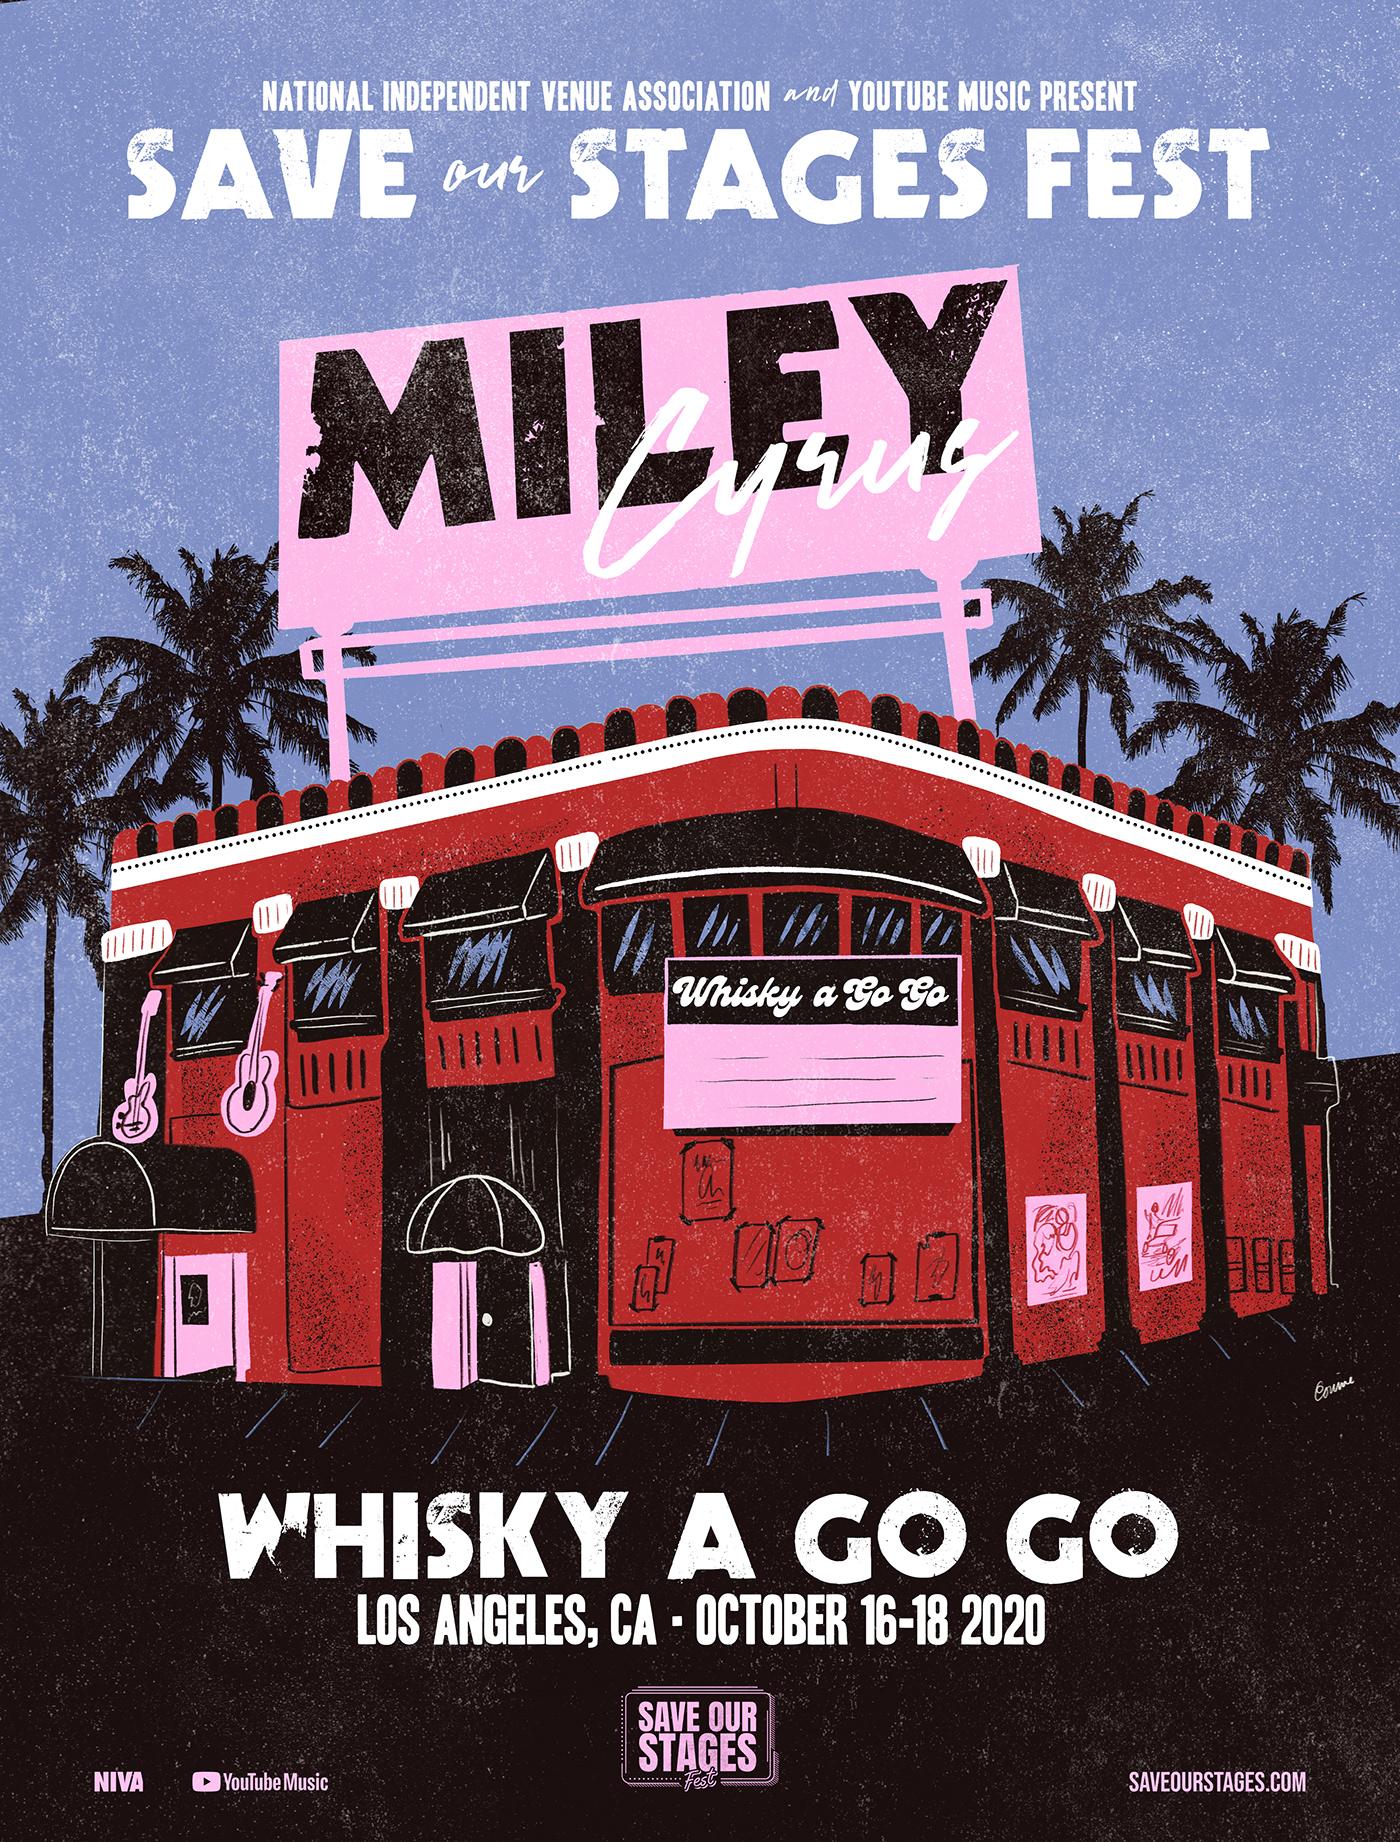 festival poster gig poster graphic design  ILLUSTRATION  Illustrator miley cyrus Music Artwork show poster